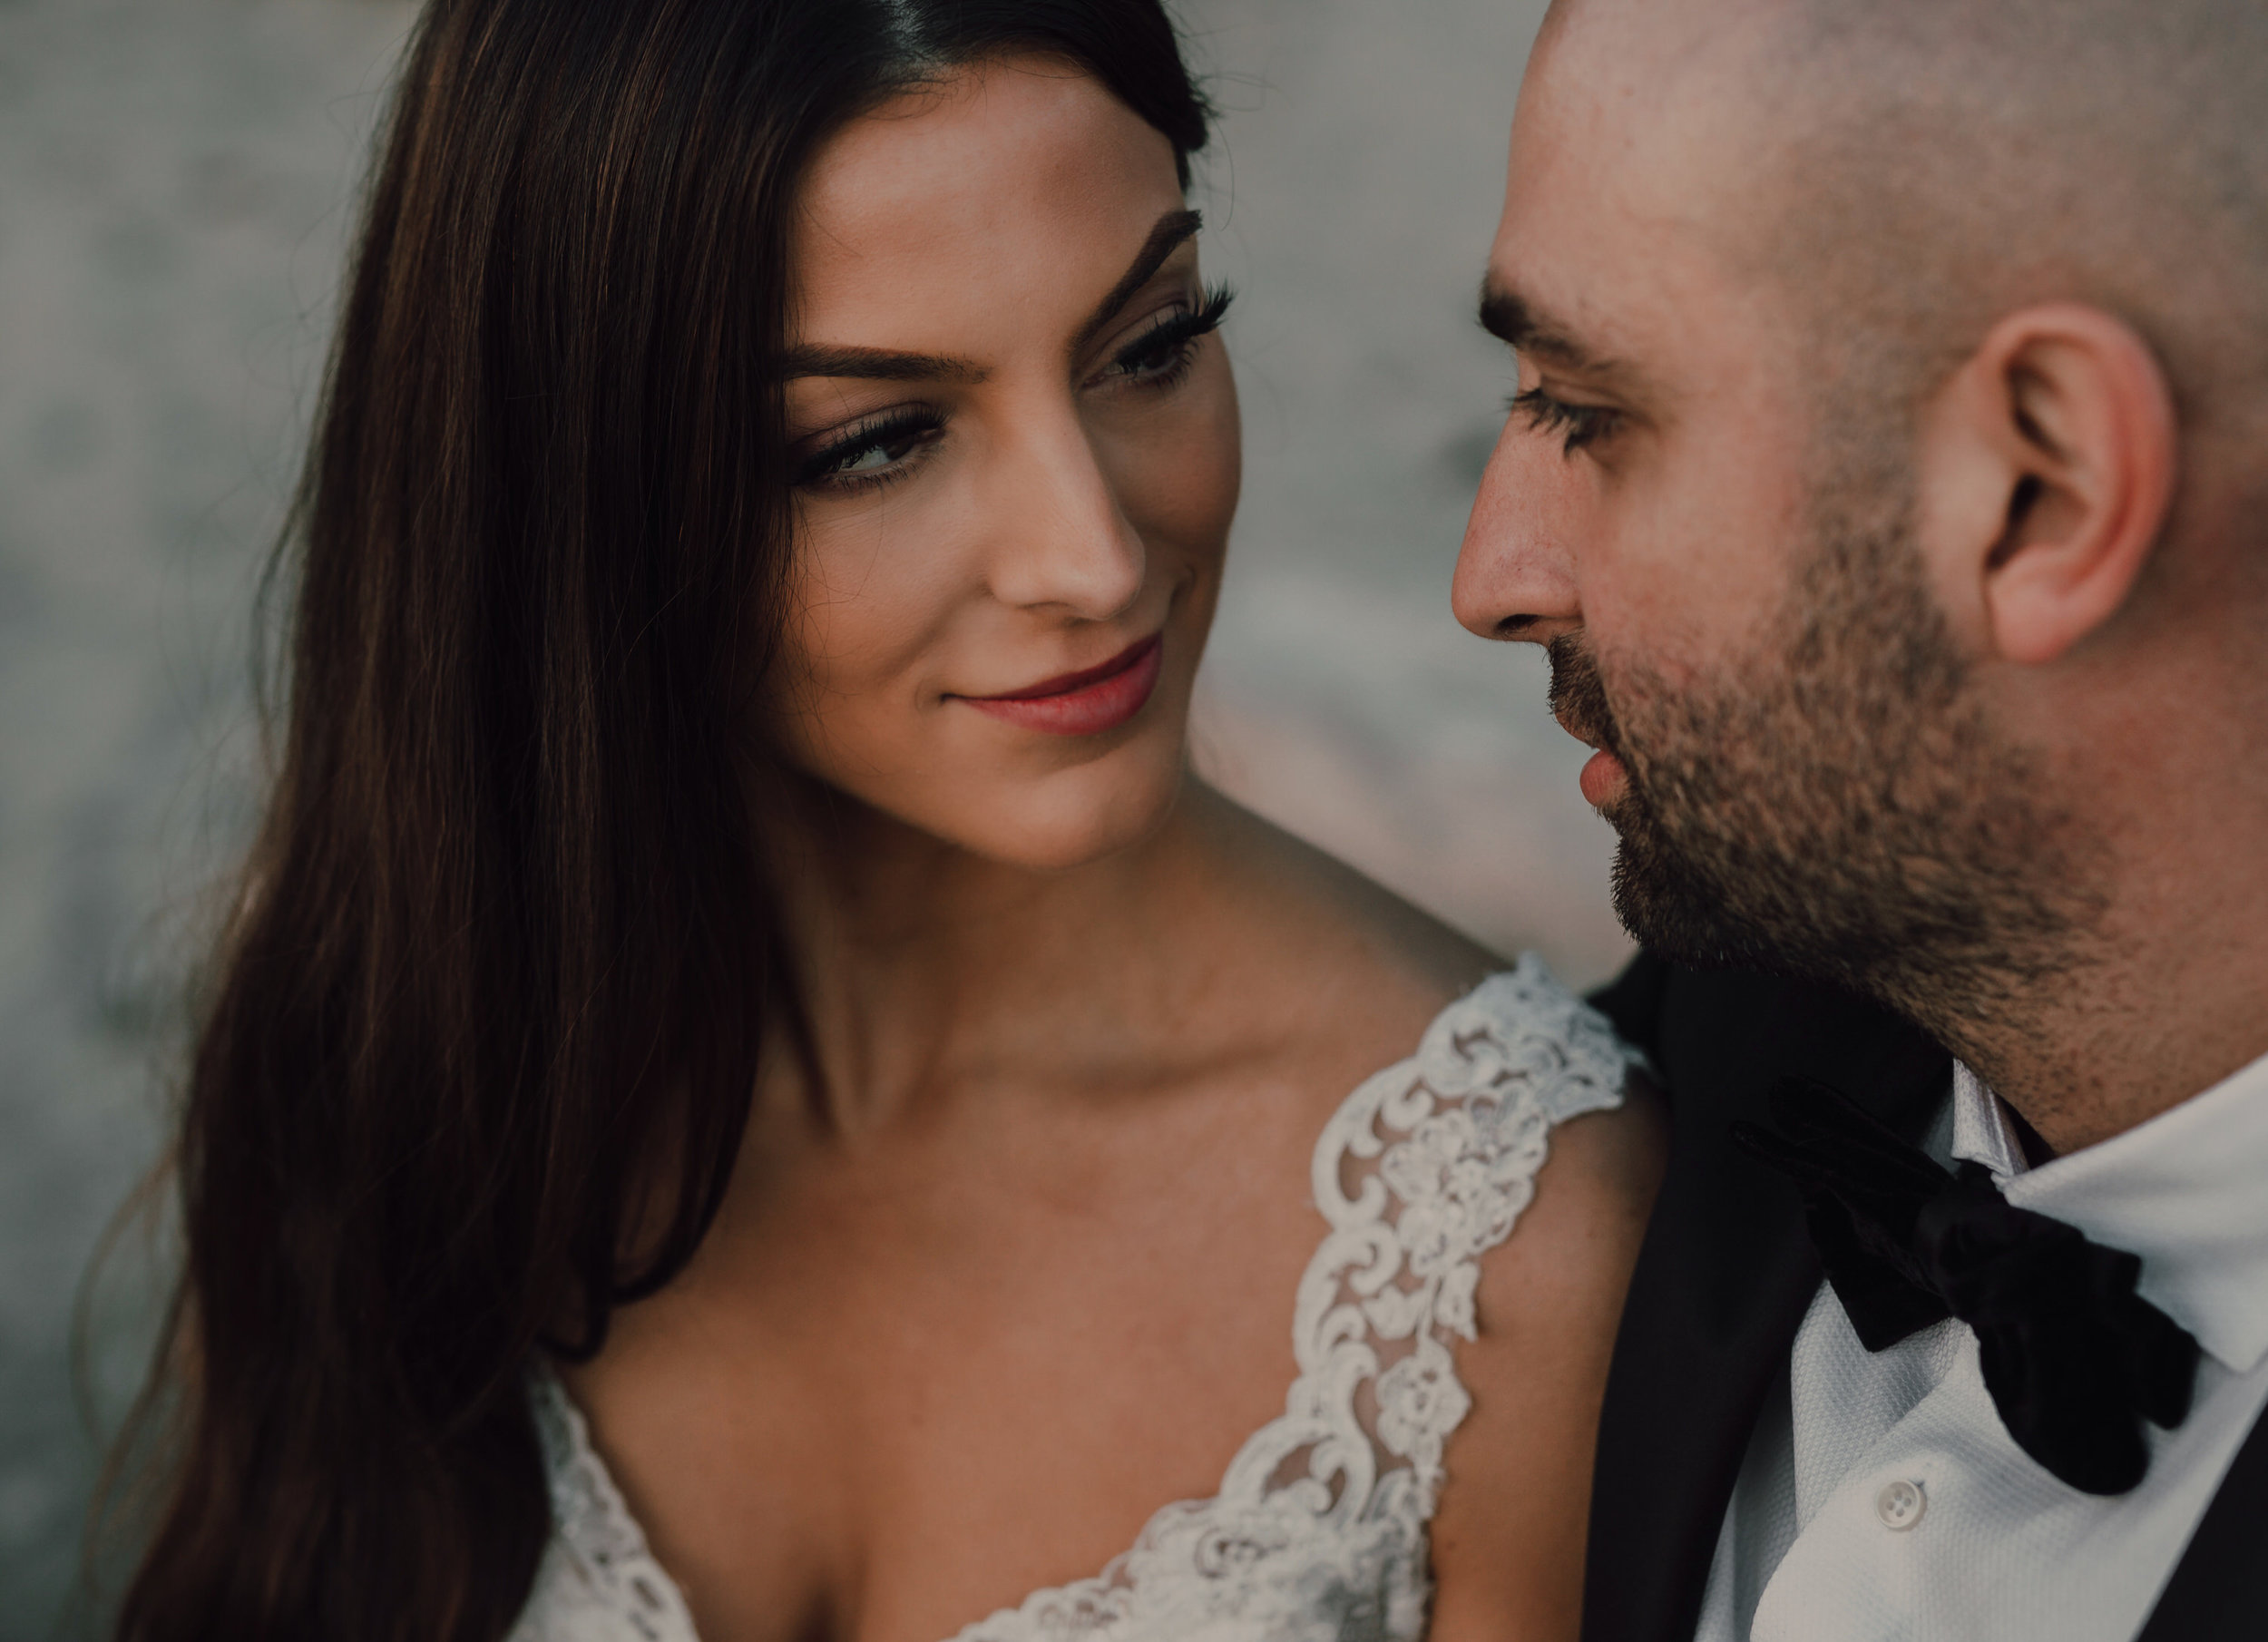 Day After Wedding Photos - Sunshine Coast Wedding Photos - Sunset Wedding Photos - Vancouver Wedding Photographer & Videographer - Sunshine Coast Wedding Photos - Sunshine Coast Wedding Photographer - Jennifer Picard Photography - 1A5A9624.jpg